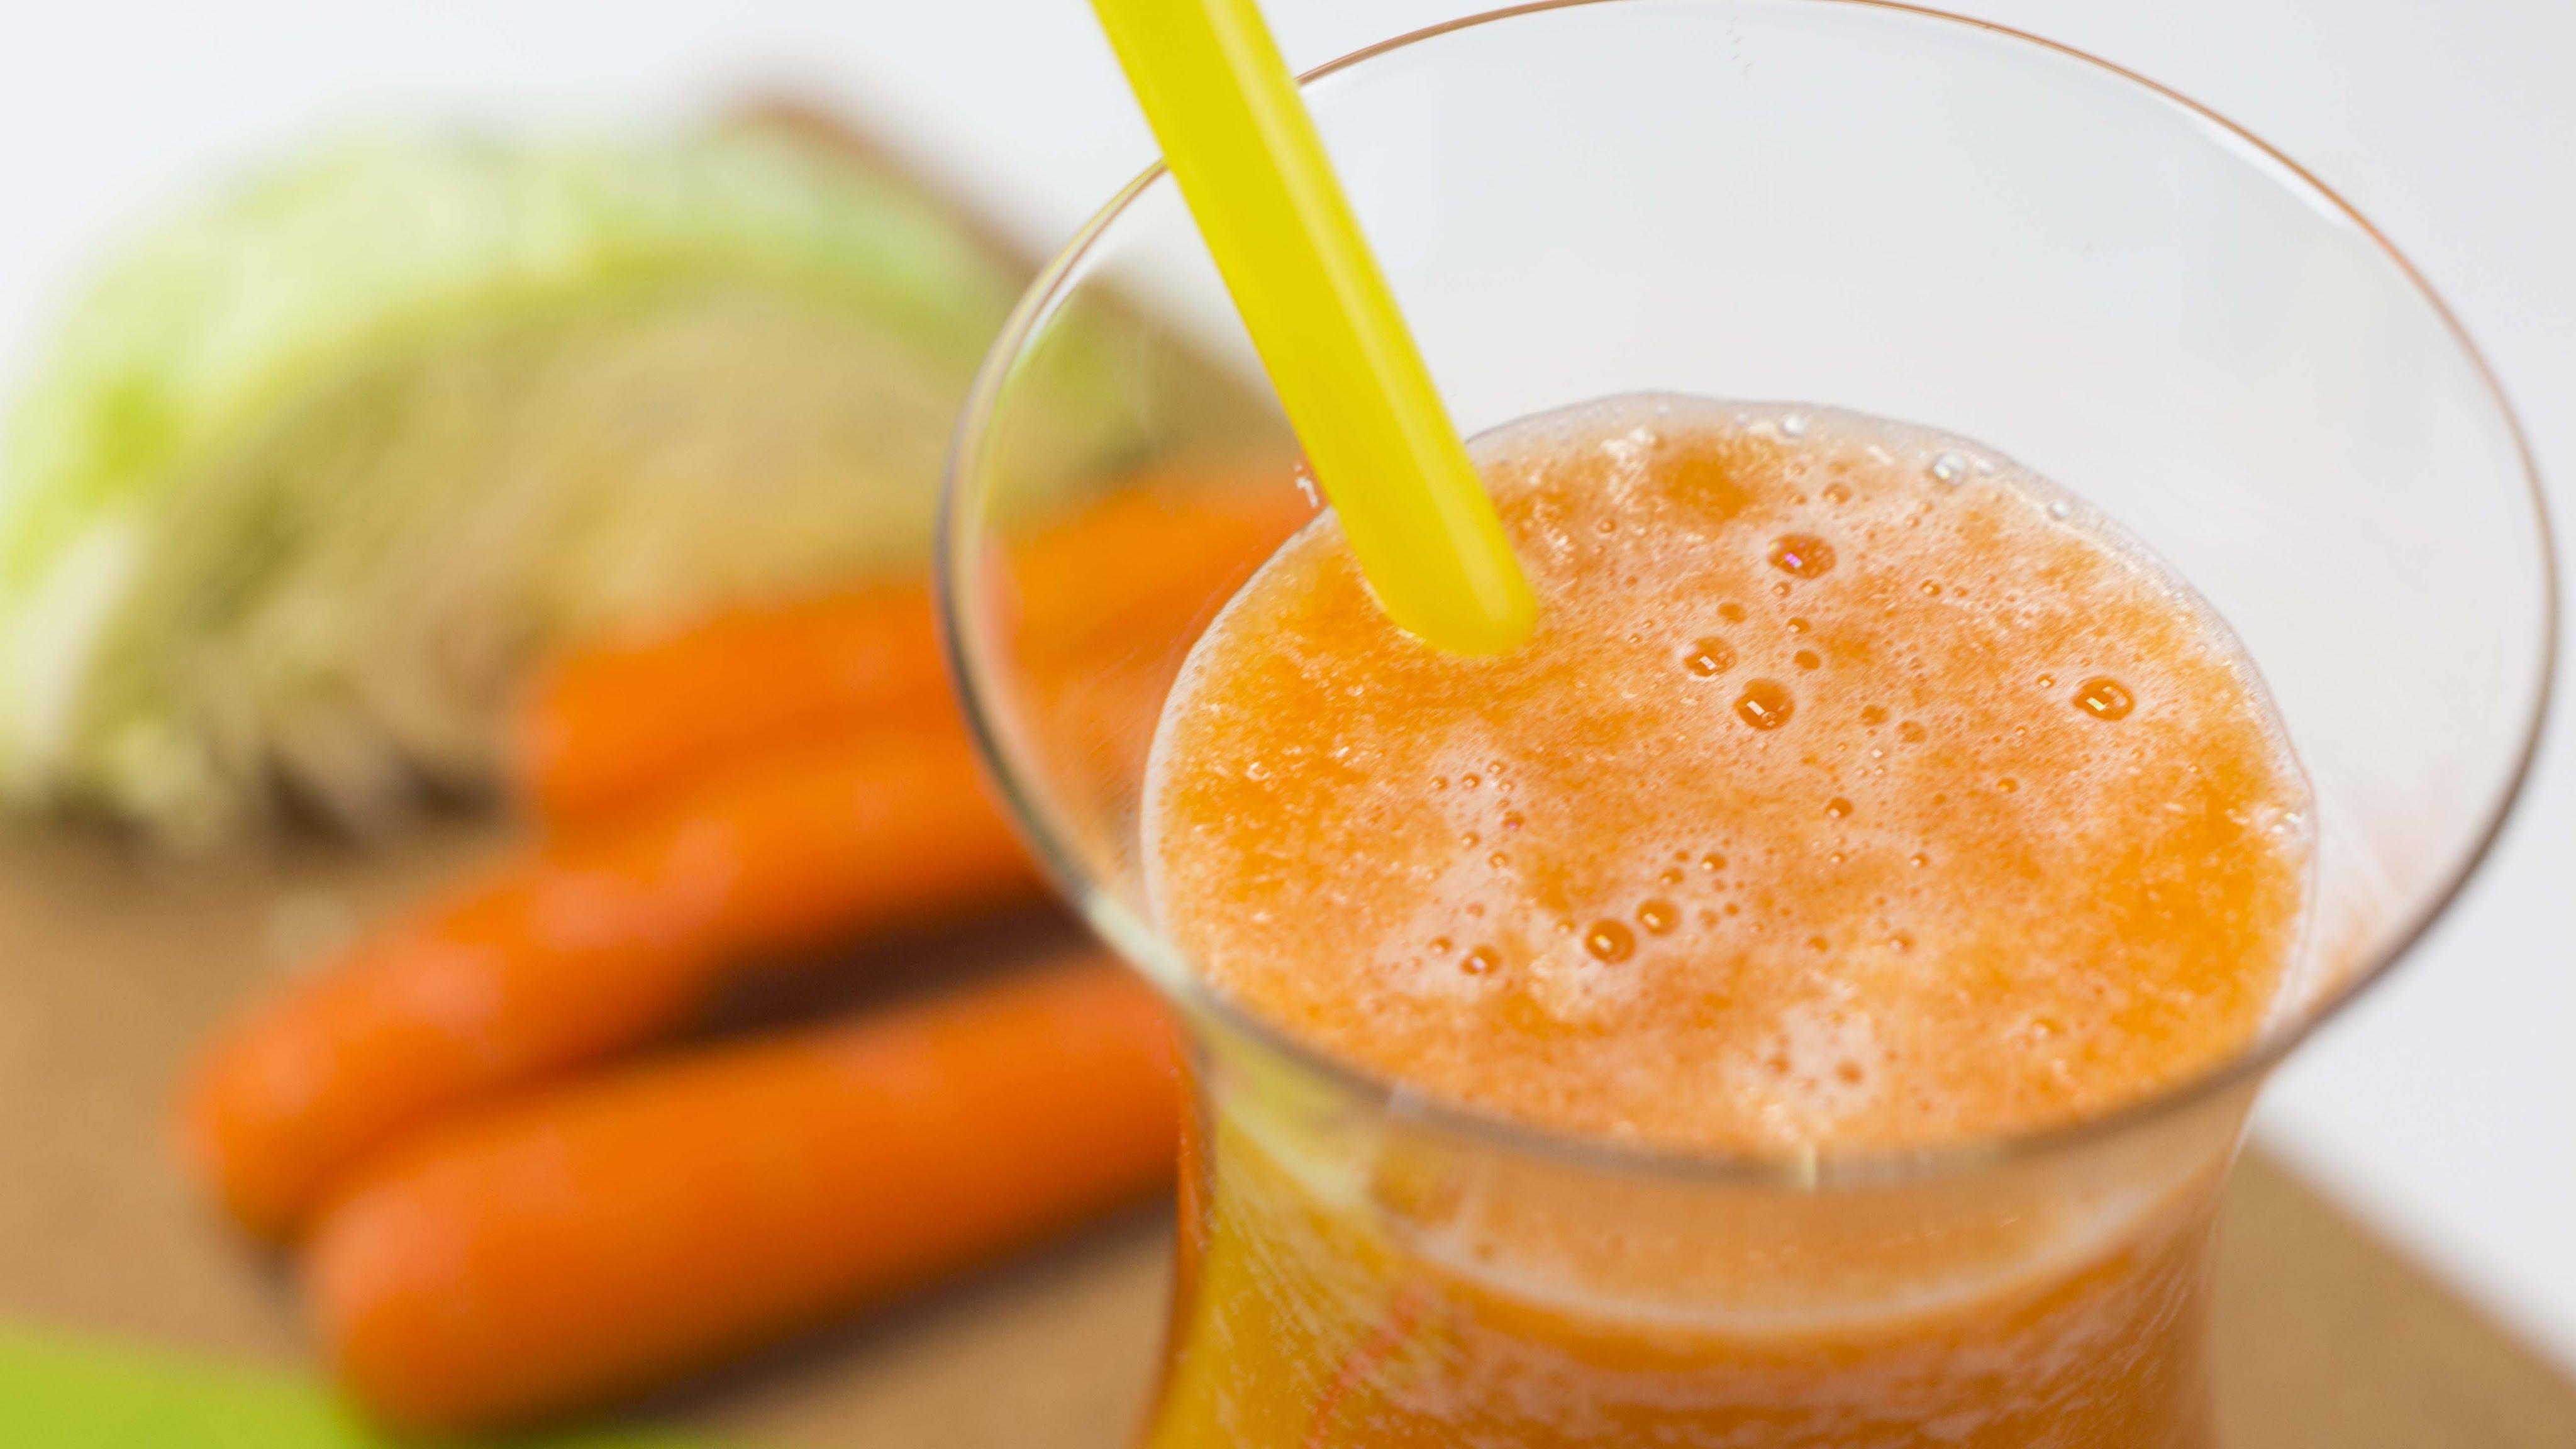 Zeleninovo-ovocný fresh s chřestem